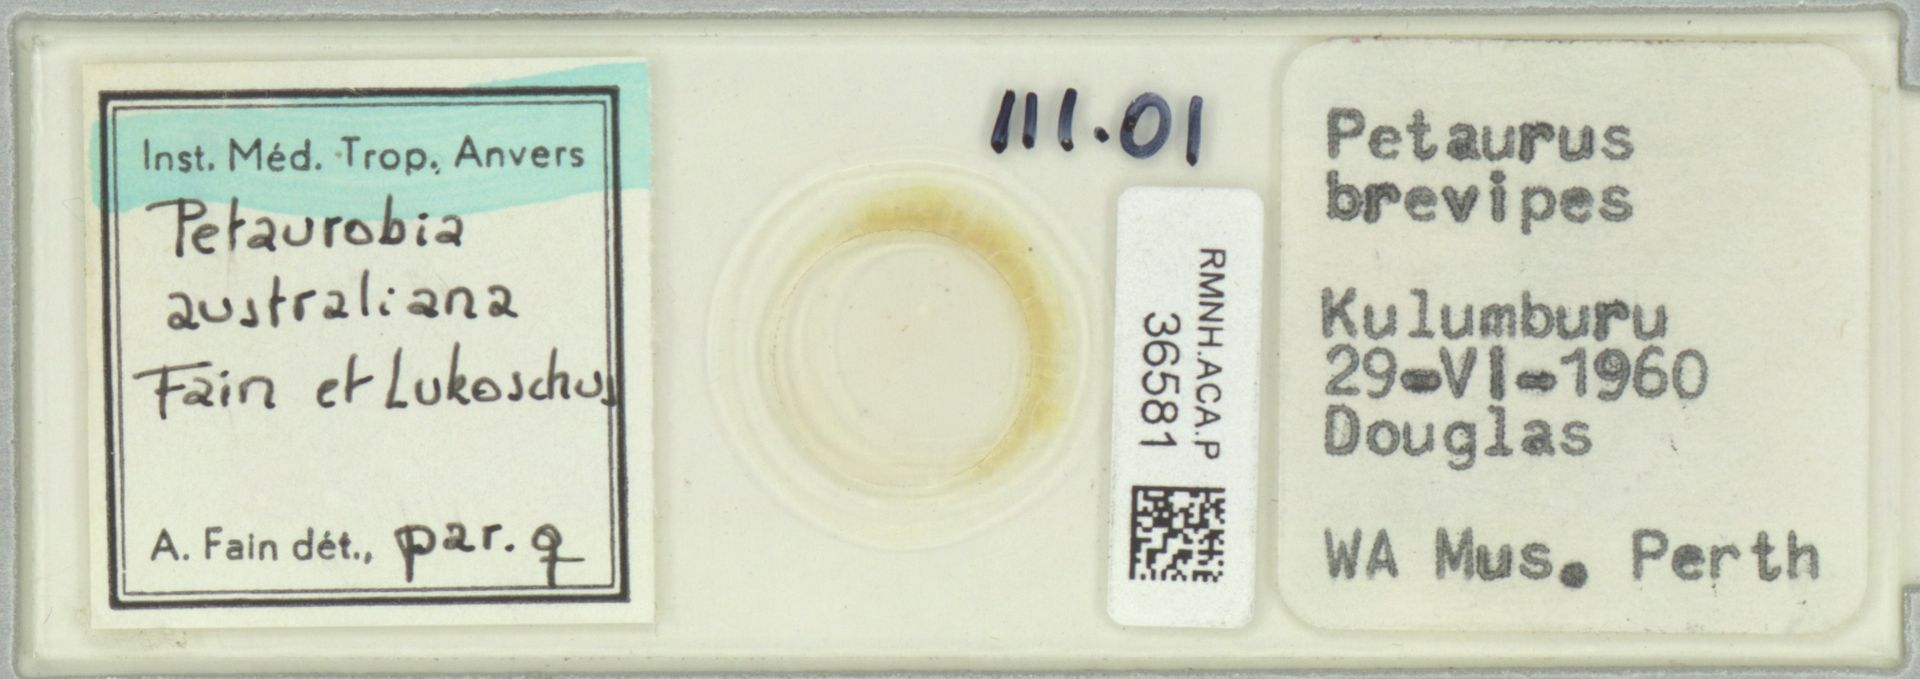 RMNH.ACA.P.36581 | Petaurobia australiana Fain et Lukoschus